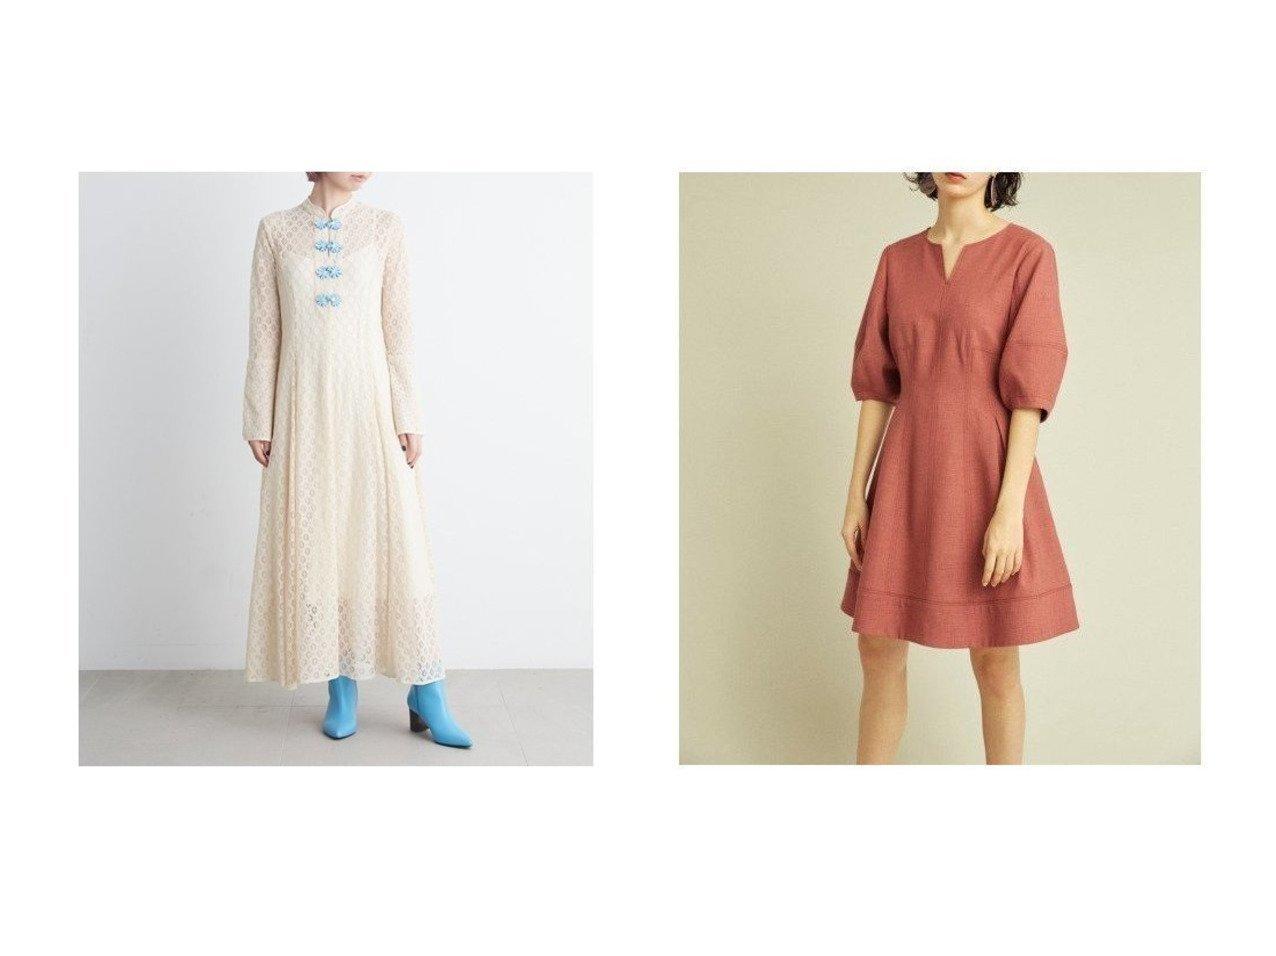 【Lily Brown/リリーブラウン】のチャイナレースワンピース&ボリュームスリーブミニワンピース Lily Brownのおすすめ!人気、トレンド・レディースファッションの通販 おすすめで人気の流行・トレンド、ファッションの通販商品 メンズファッション・キッズファッション・インテリア・家具・レディースファッション・服の通販 founy(ファニー) https://founy.com/ ファッション Fashion レディースファッション WOMEN ワンピース Dress インナー エレガント カフス スマート スリット 人気 バランス フレア ミックス レース 再入荷 Restock/Back in Stock/Re Arrival デコルテ デニム 定番 Standard ロング ワーク  ID:crp329100000019628